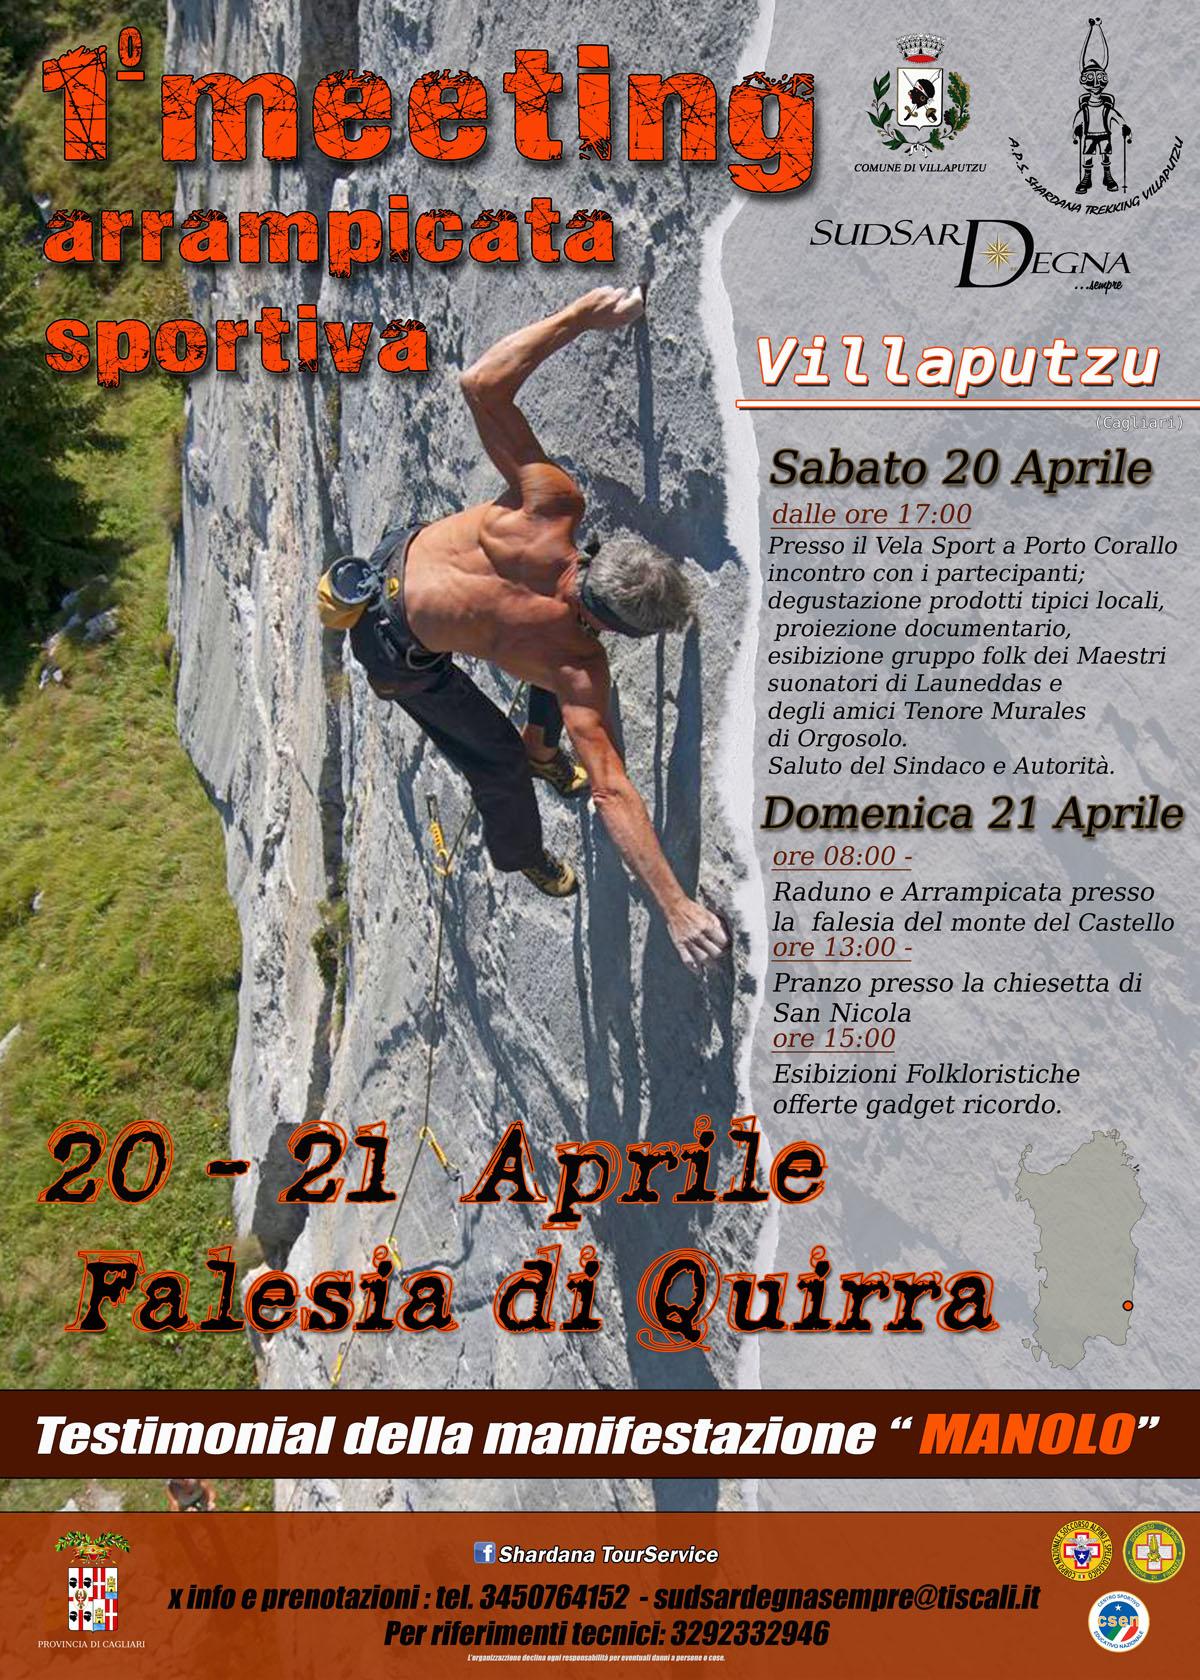 Arrampicata Sportiva a Quirra nel Comune di Villaputzu